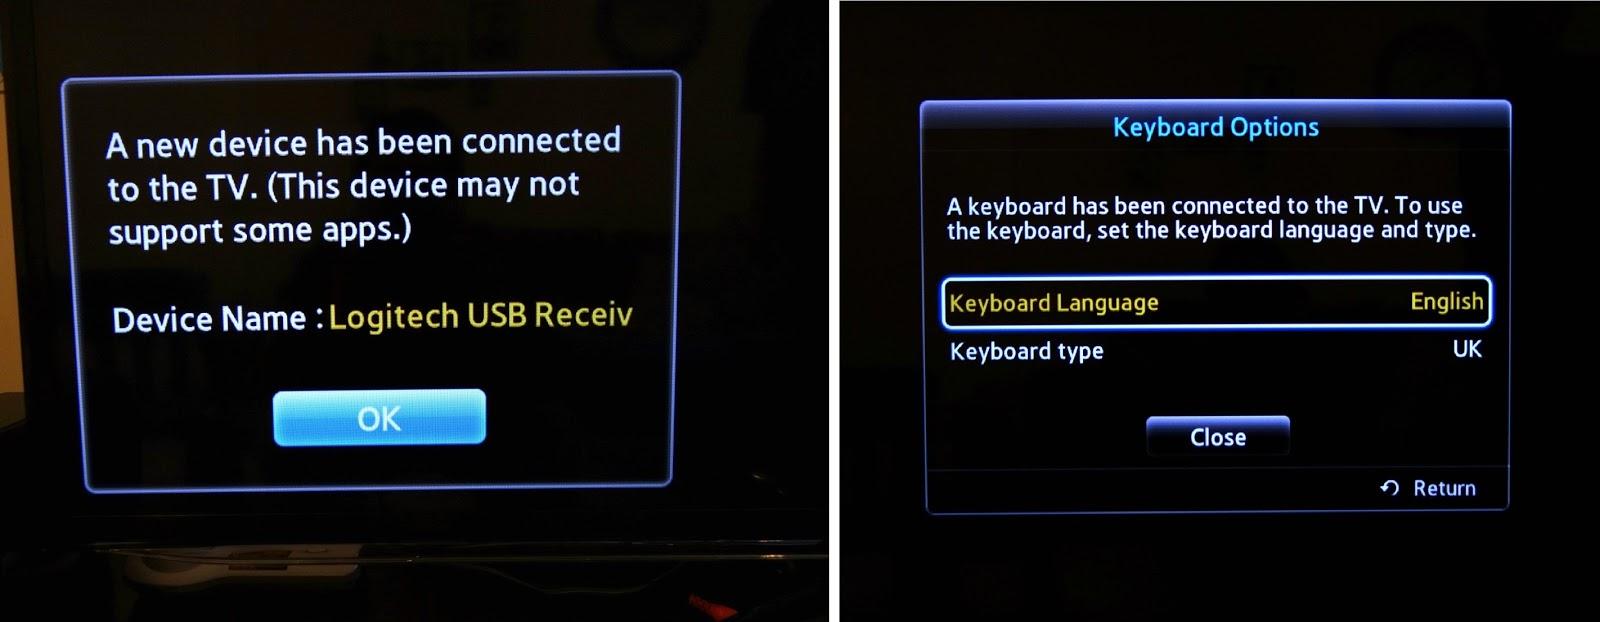 Logitech Keyboard, PC to TV entertainment, Wireless keyboard for TV